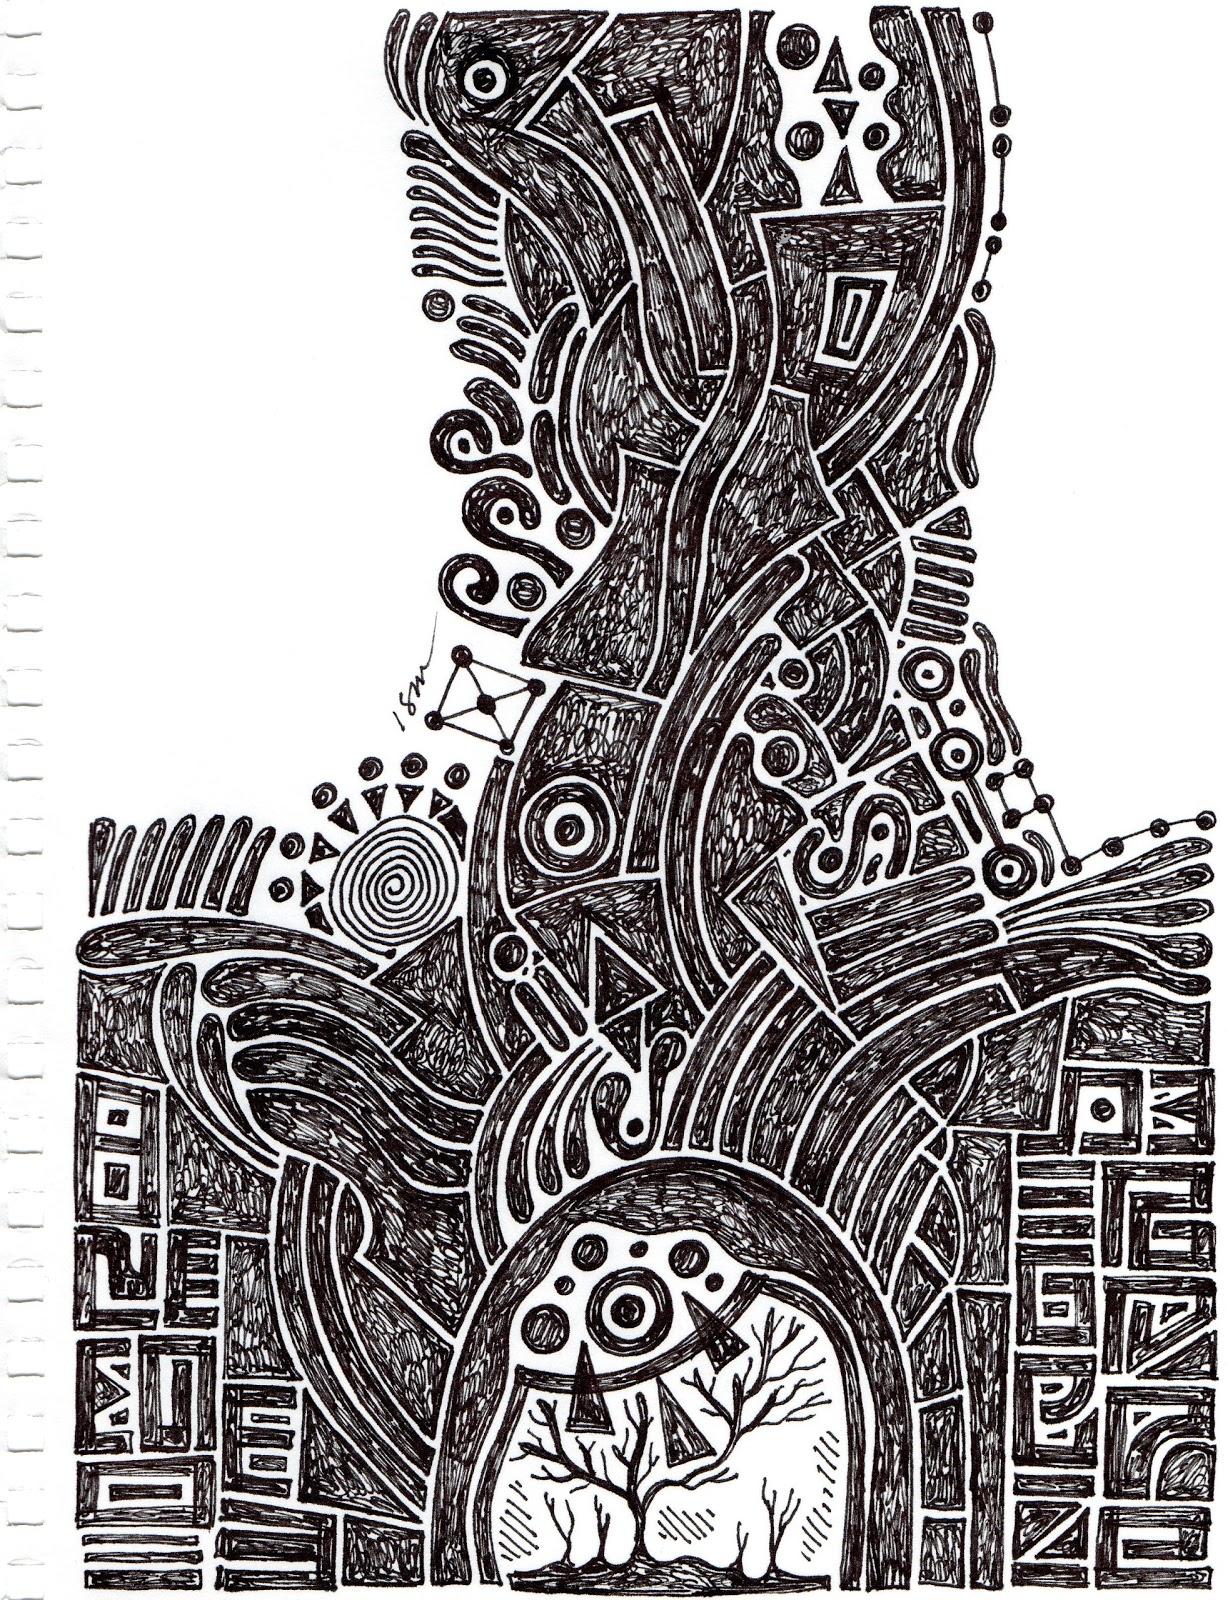 ronald d isom sr adinkra symbols physics and my doodles